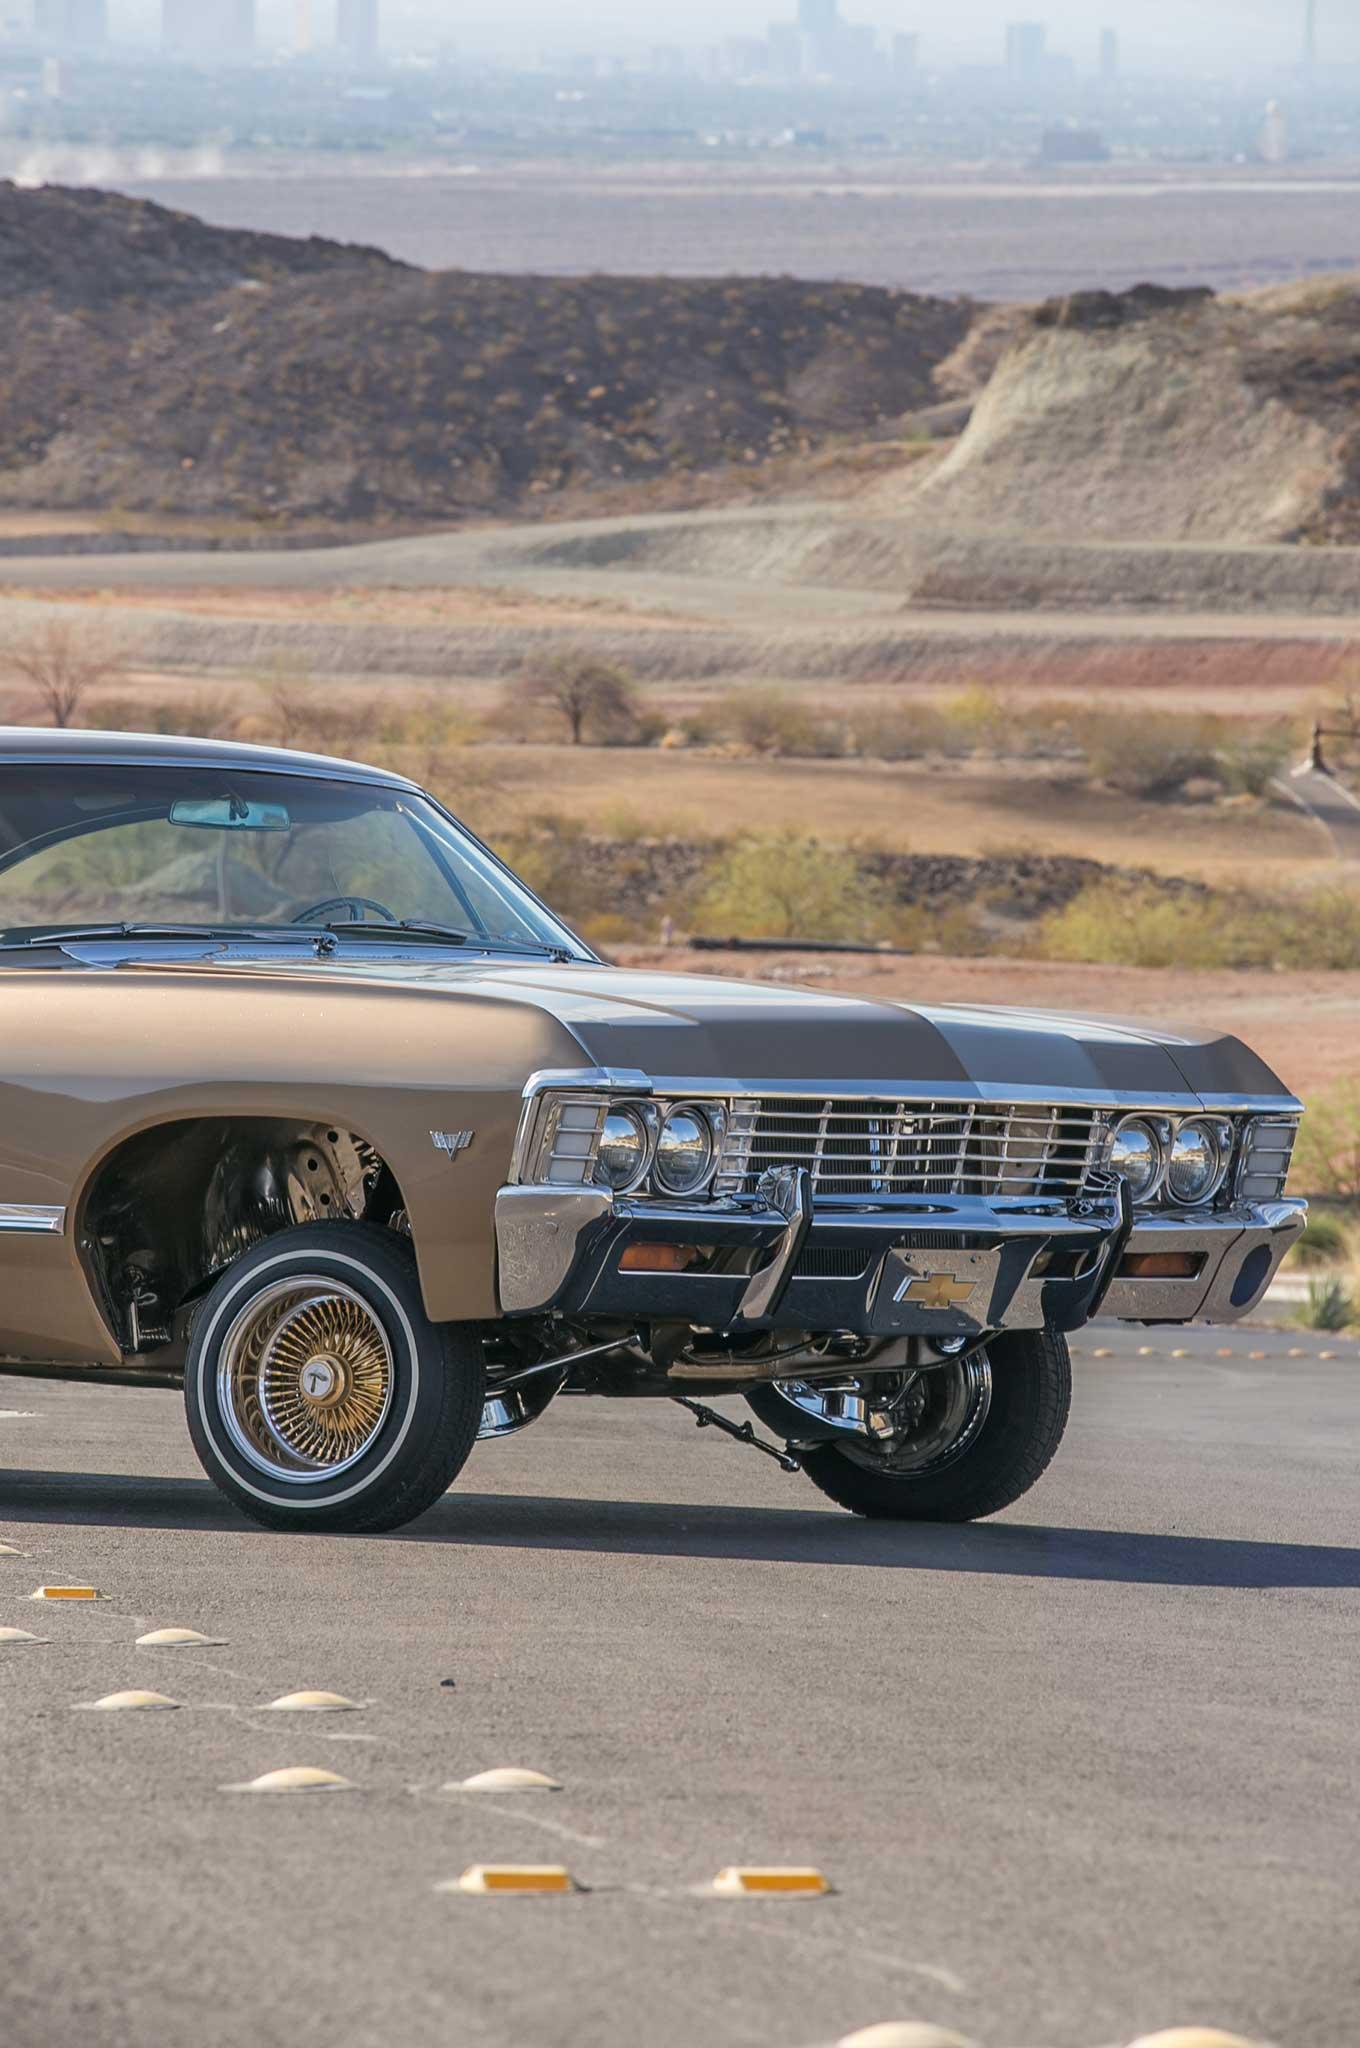 1967 Chevrolet Impala Cesar S Palace Lowrider